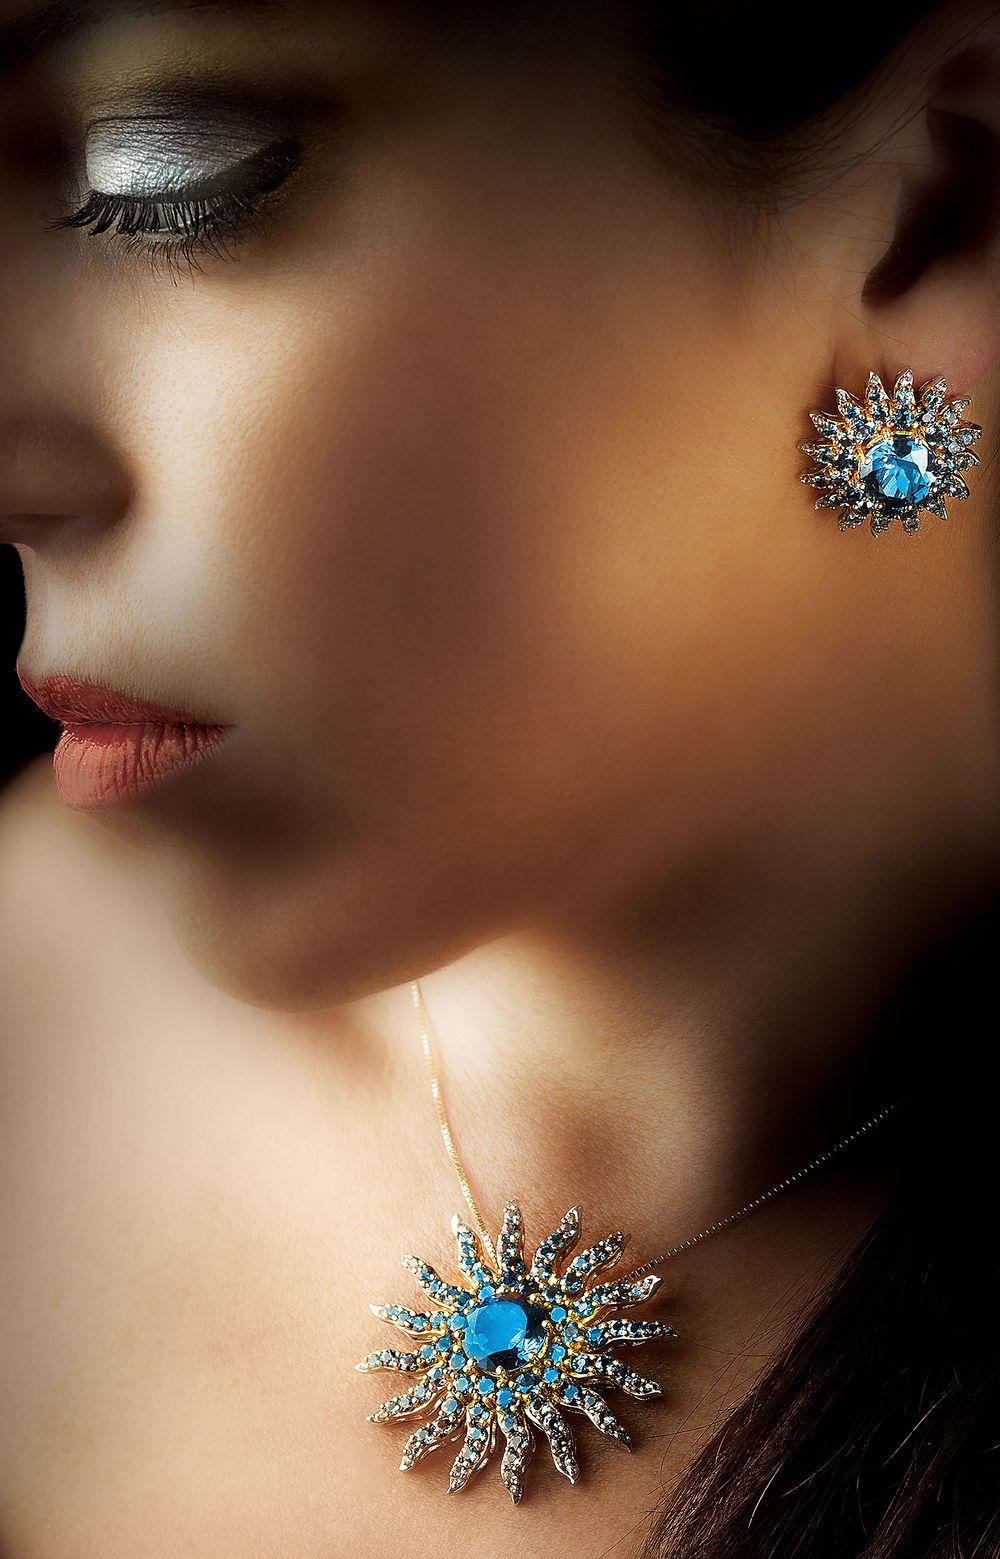 Palmetto_Saphire-Necklace_Earrings_V1.jpg